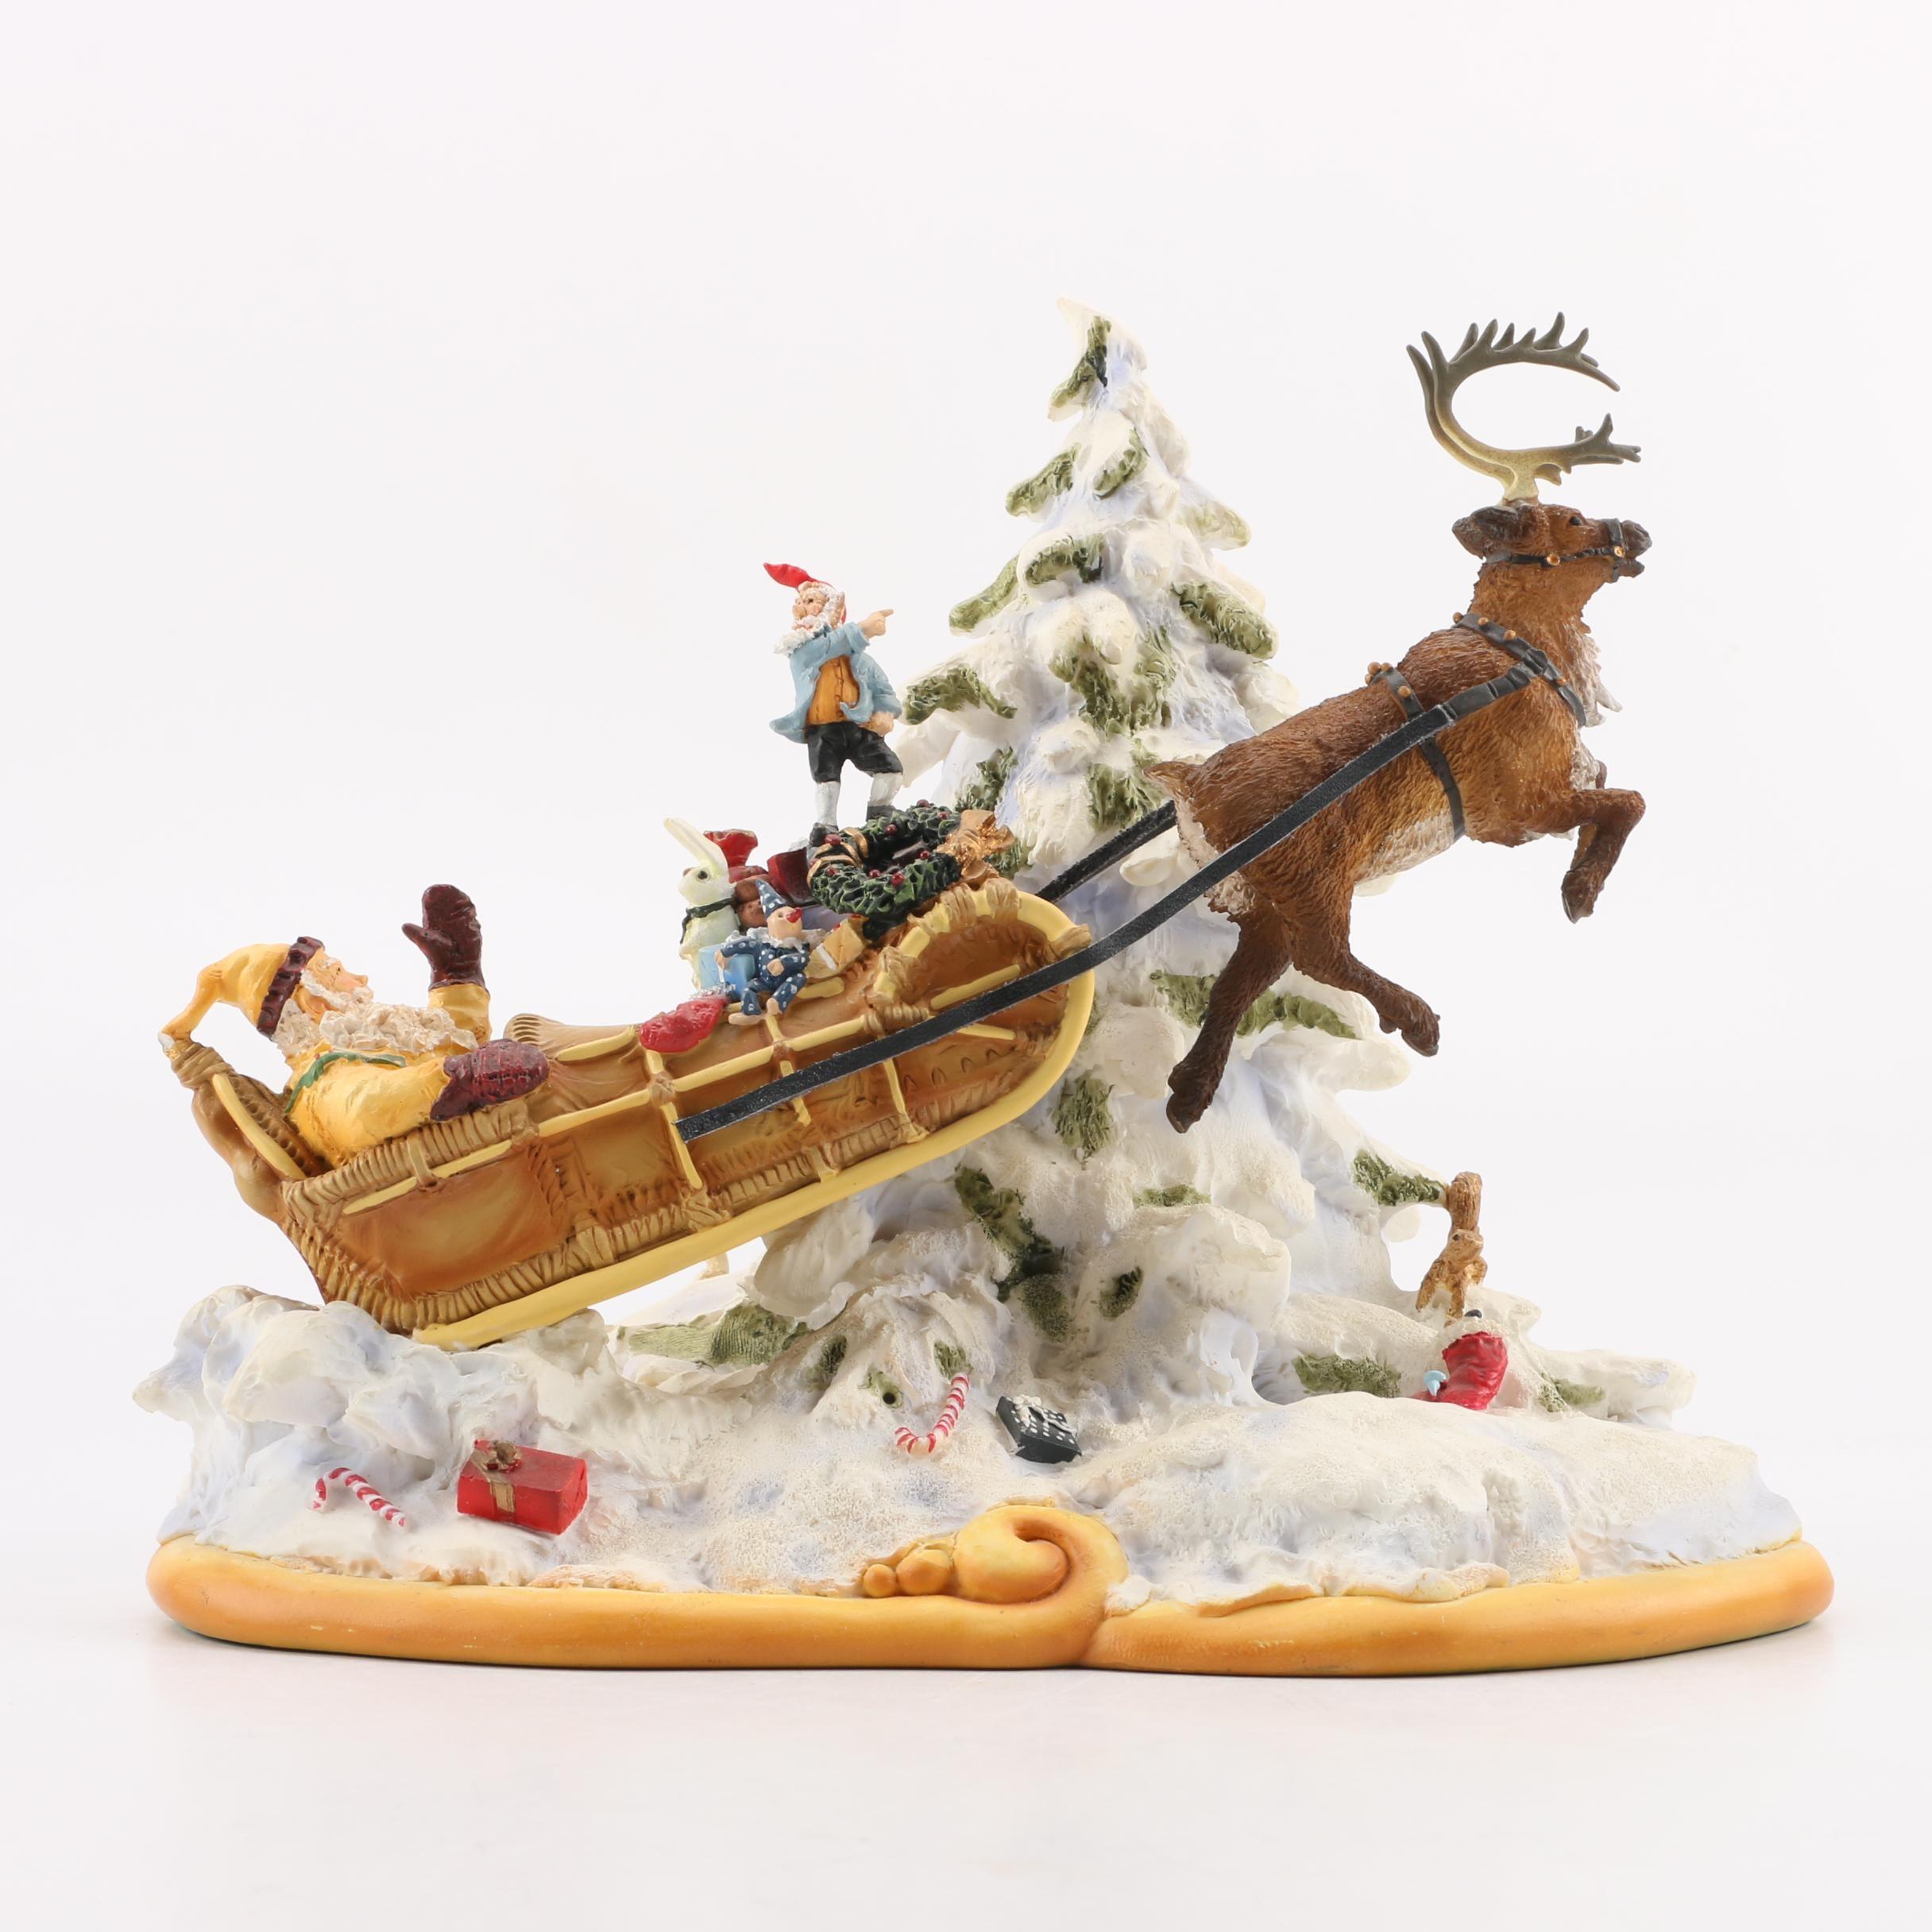 Maruri Limited Edition Figurine Entitled Santa's Air Express